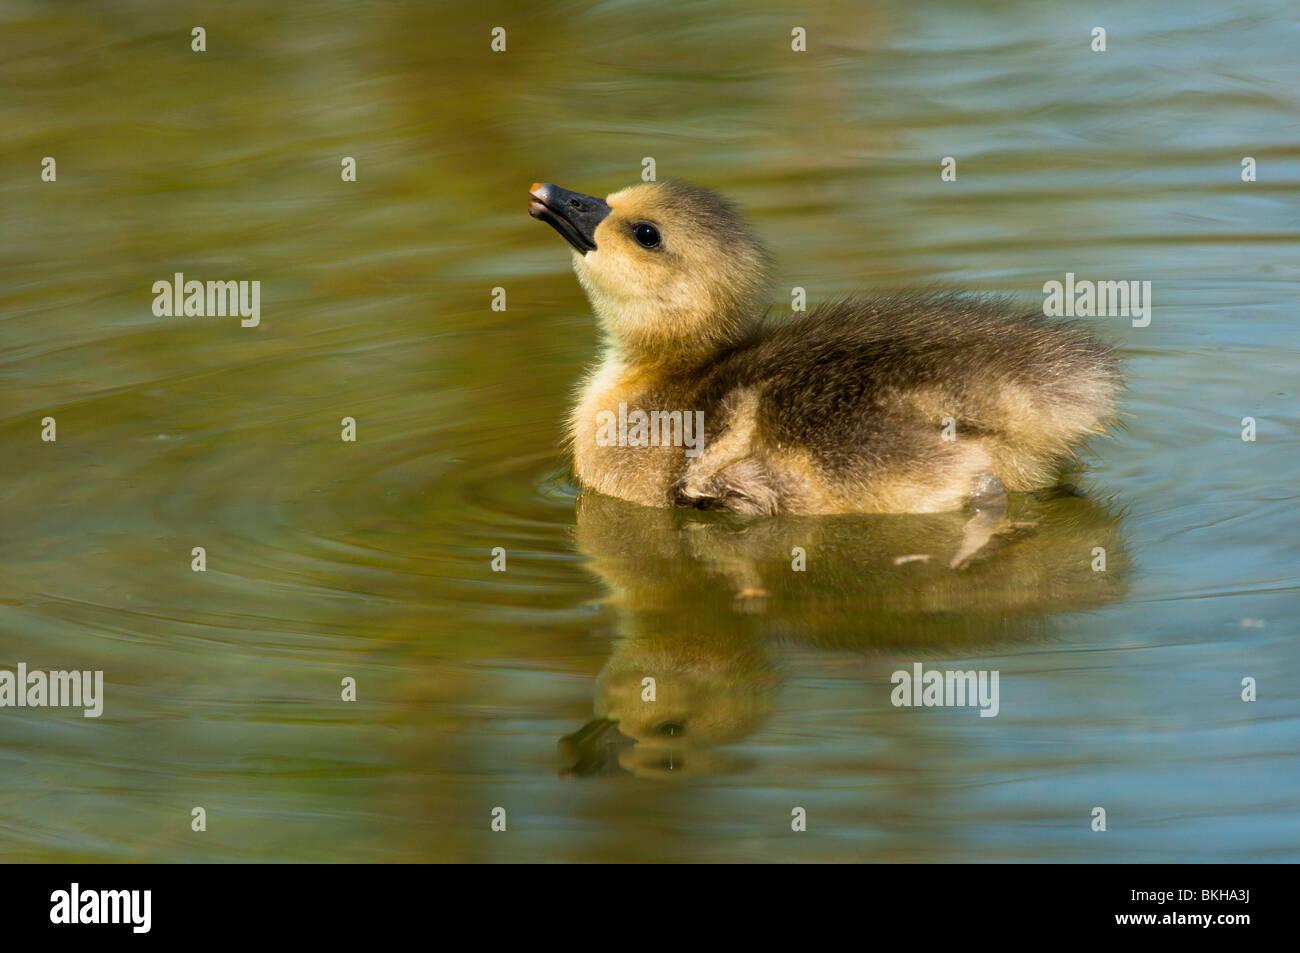 Baby Greylag goose - Stock Image